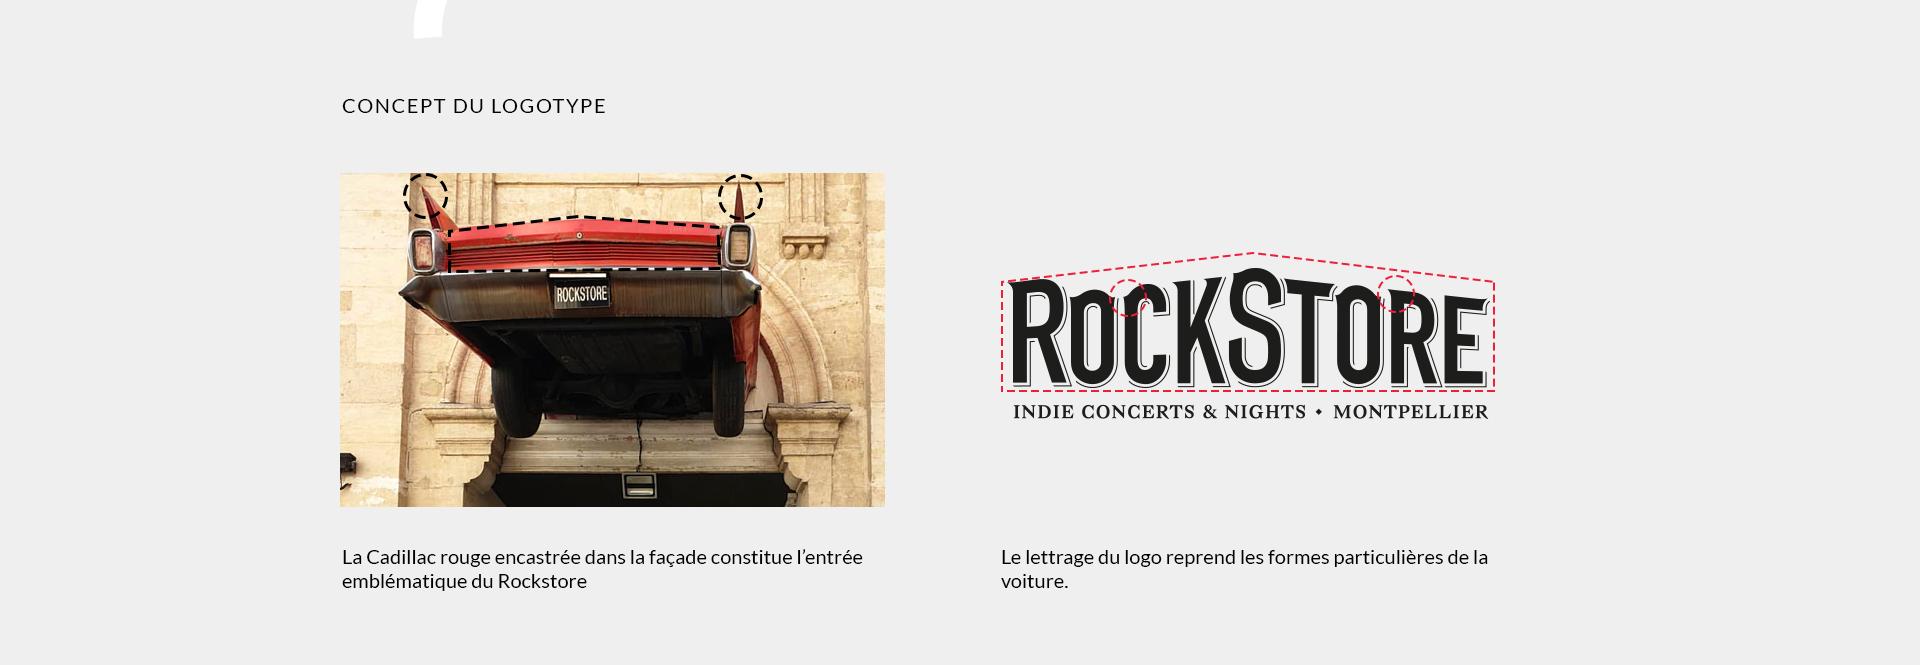 rockstorepresentation-2